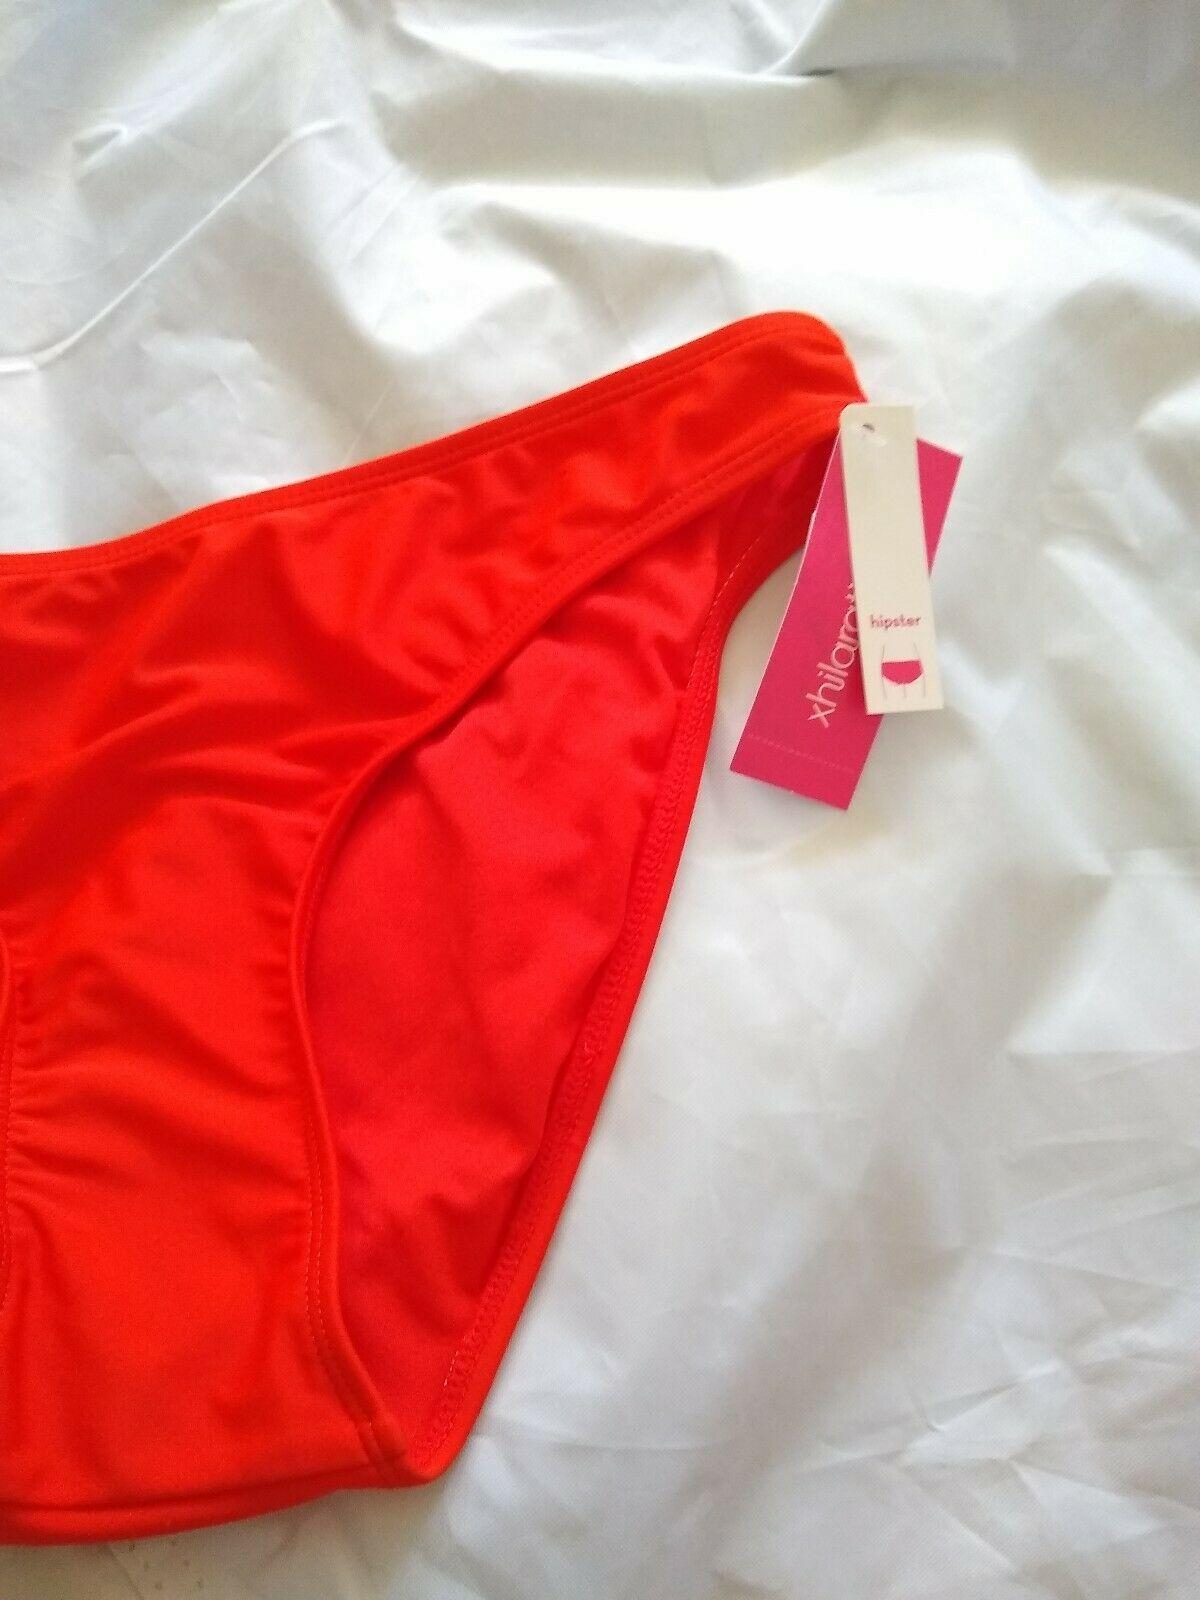 Xhilaration Women's Hipster Red Bikini Bottom Size XL image 4